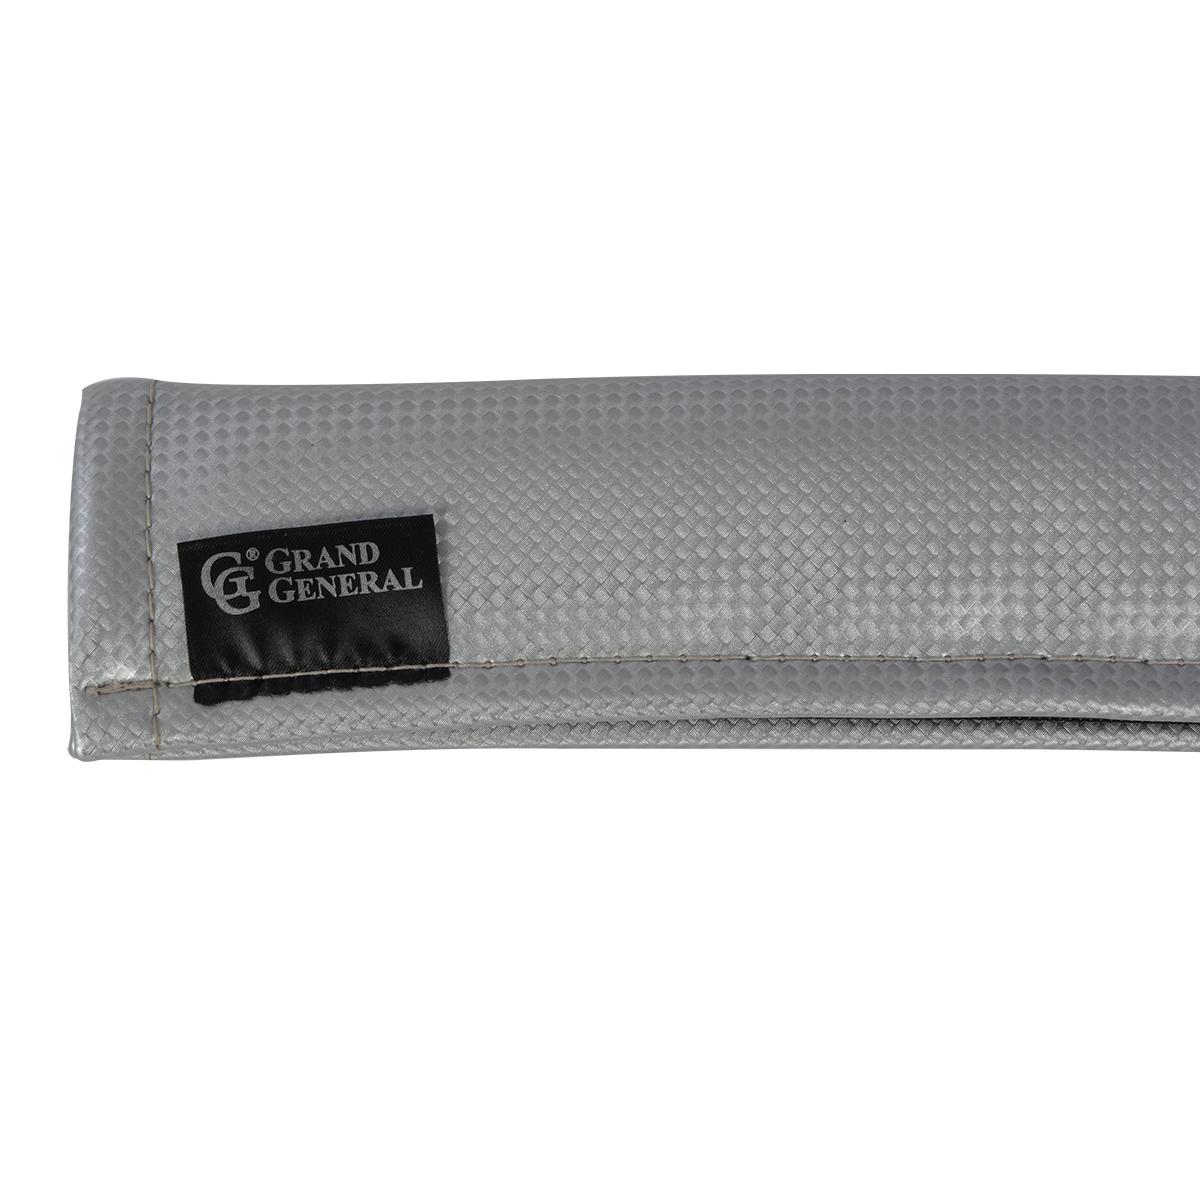 "99665 Gear Shift Stick Covers in 17"" (L)"